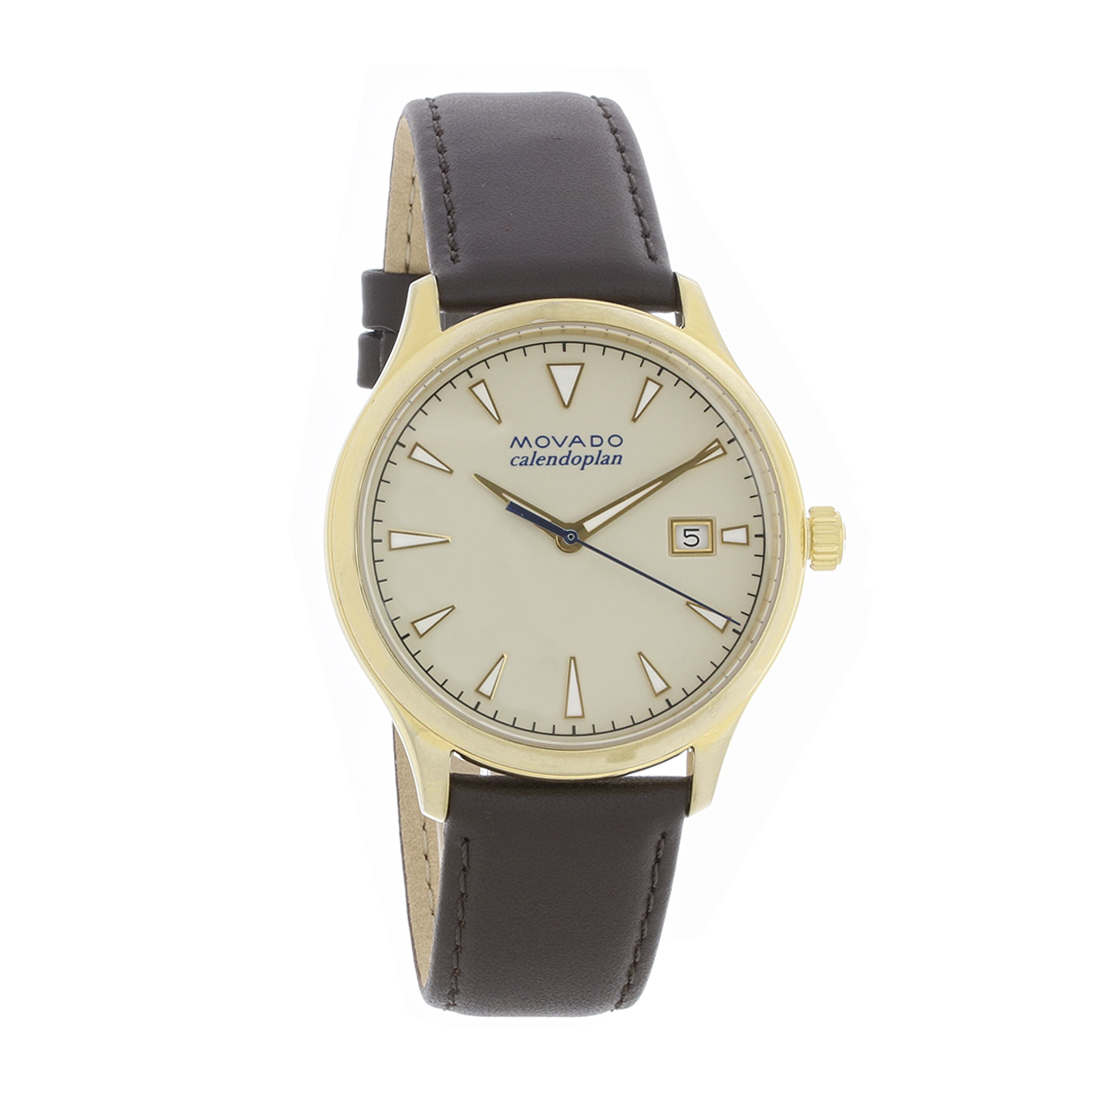 c36a7e2b3ab Movado Heritage Calendoplan Mens Gold Plated Stainless Quartz Watch 3650003